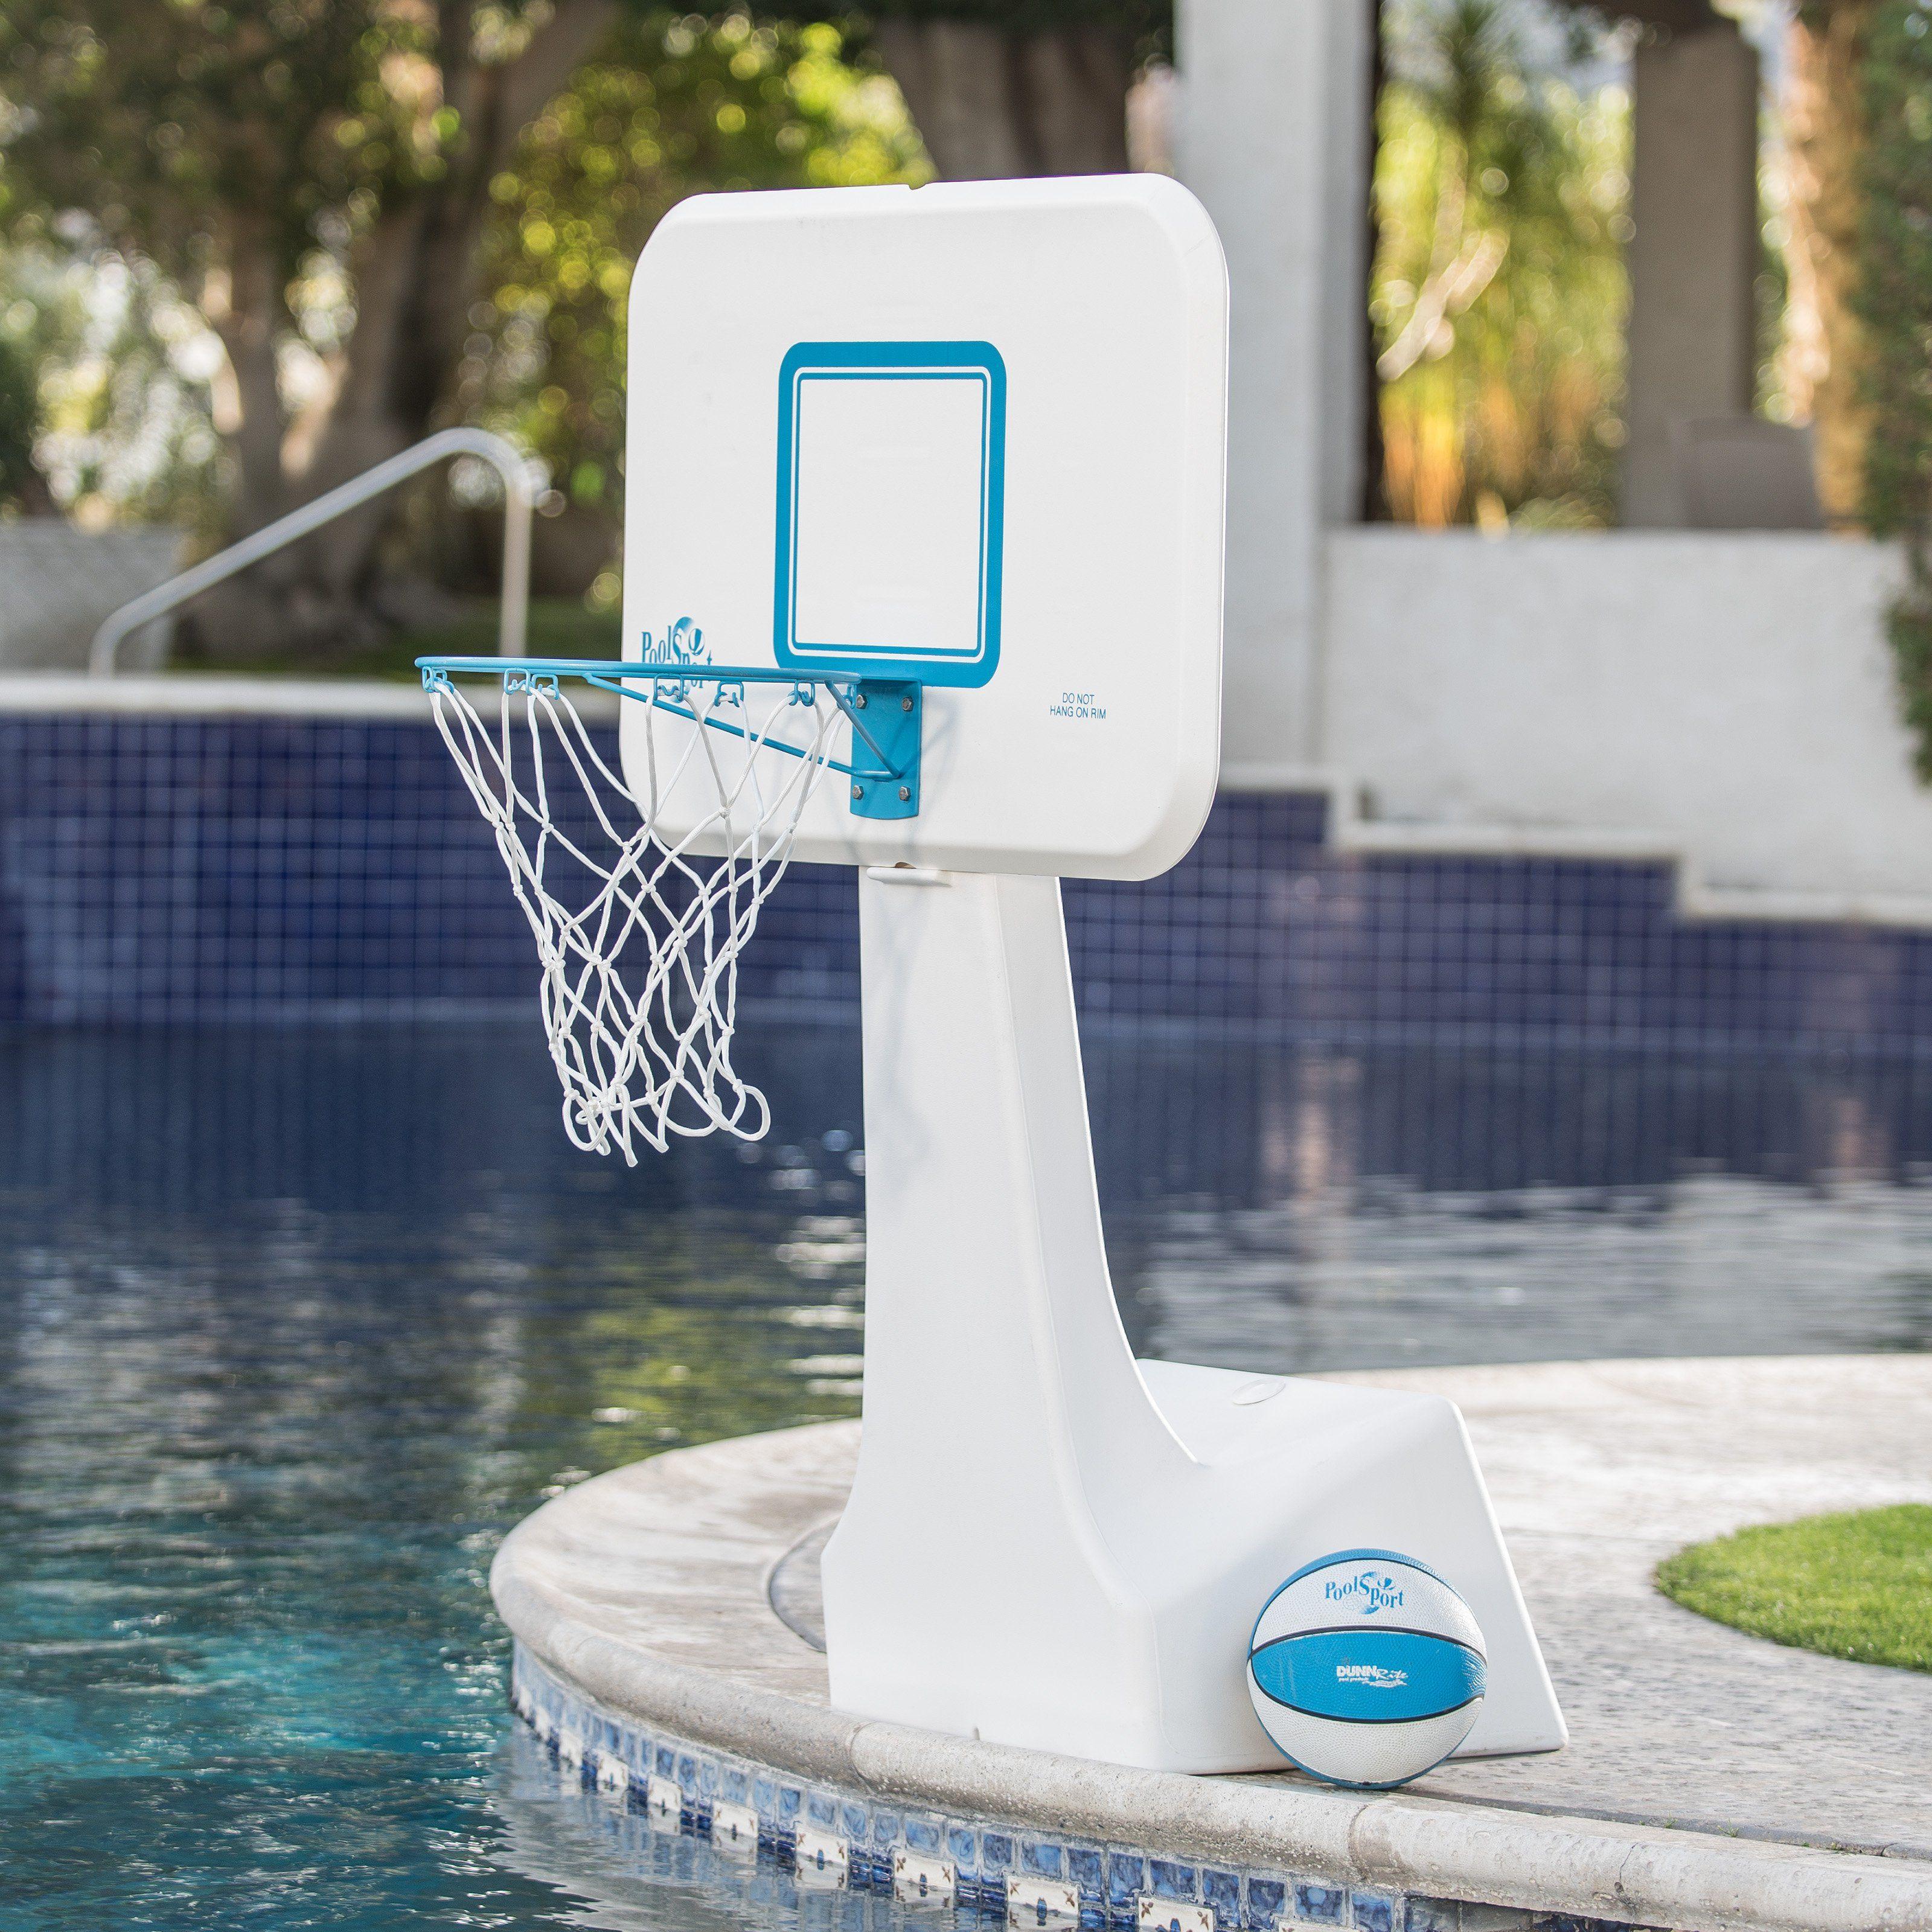 Dunn Rite Poolsport Portable Pool Basketball Hoop The Dunn Rite Poolsport Portable Pool Basketball Ho Portable Pools Pool Basketball Portable Basketball Hoop